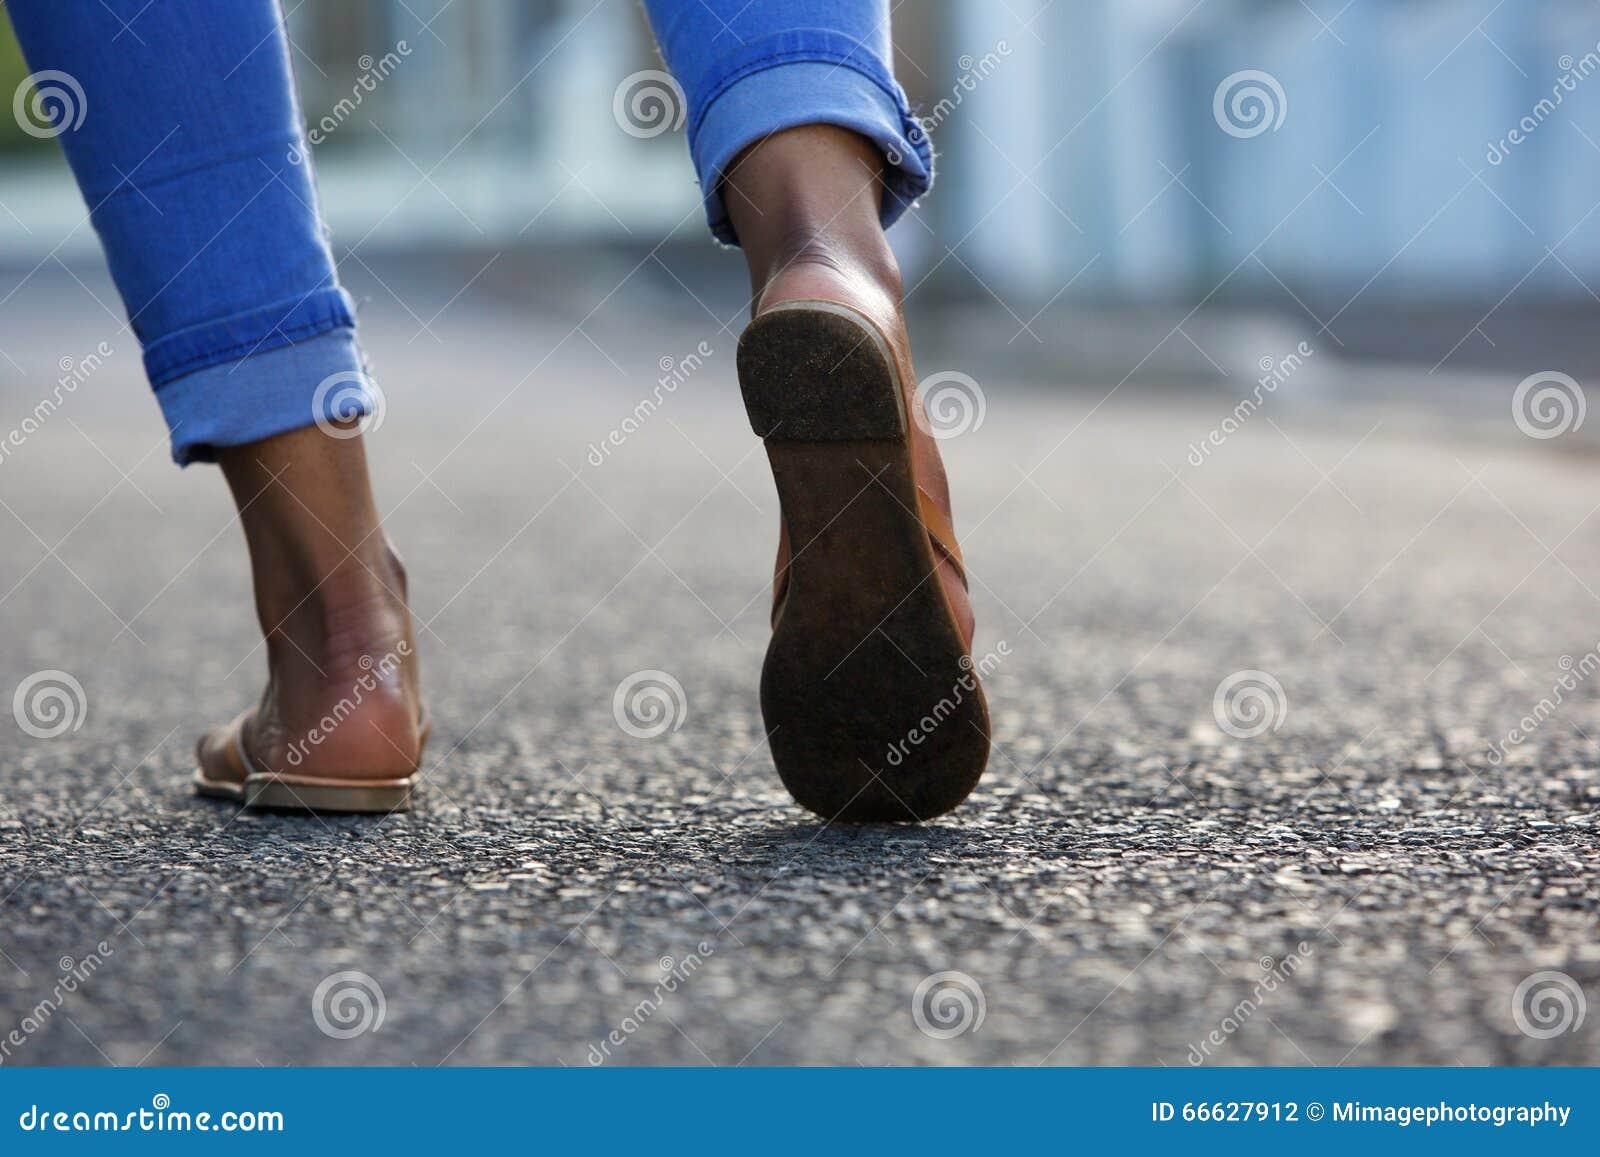 Woman Walking On City Street Stock Photo Image 66627912